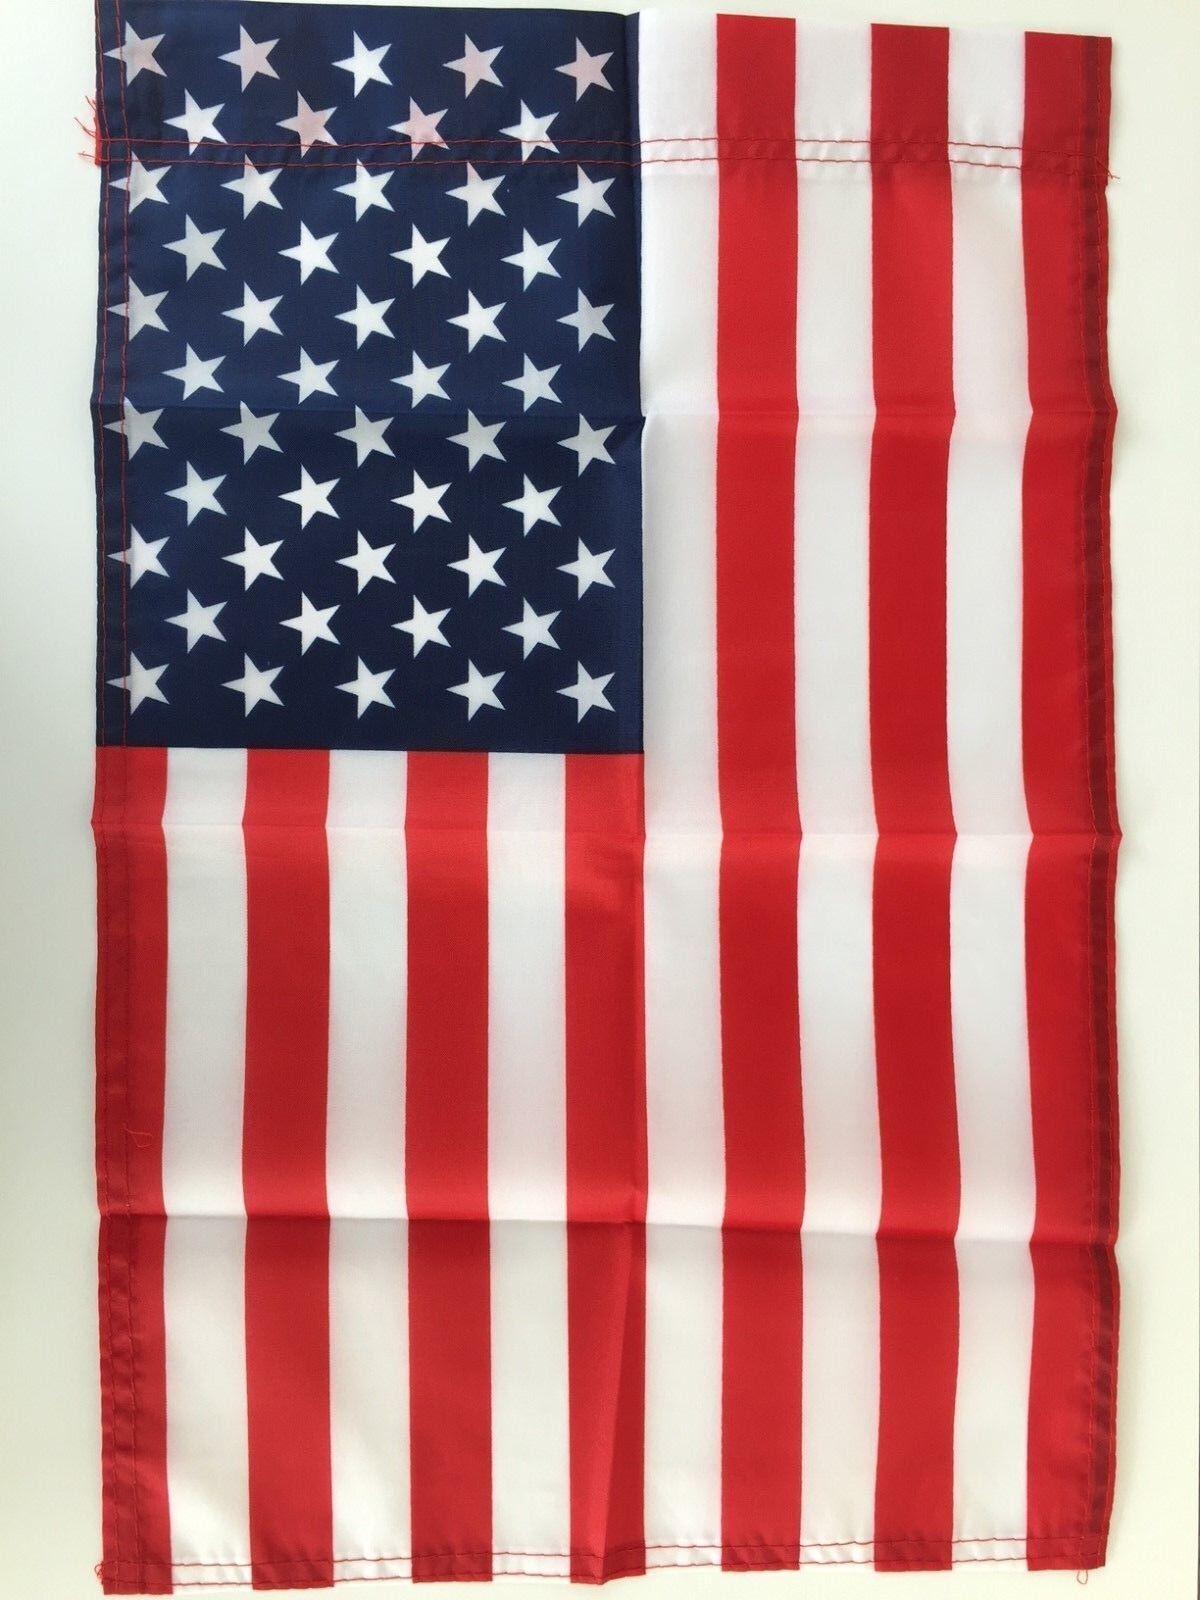 PringCor 3x5FT Marine Corps American FLAG USMC Marines Banner US USA Military